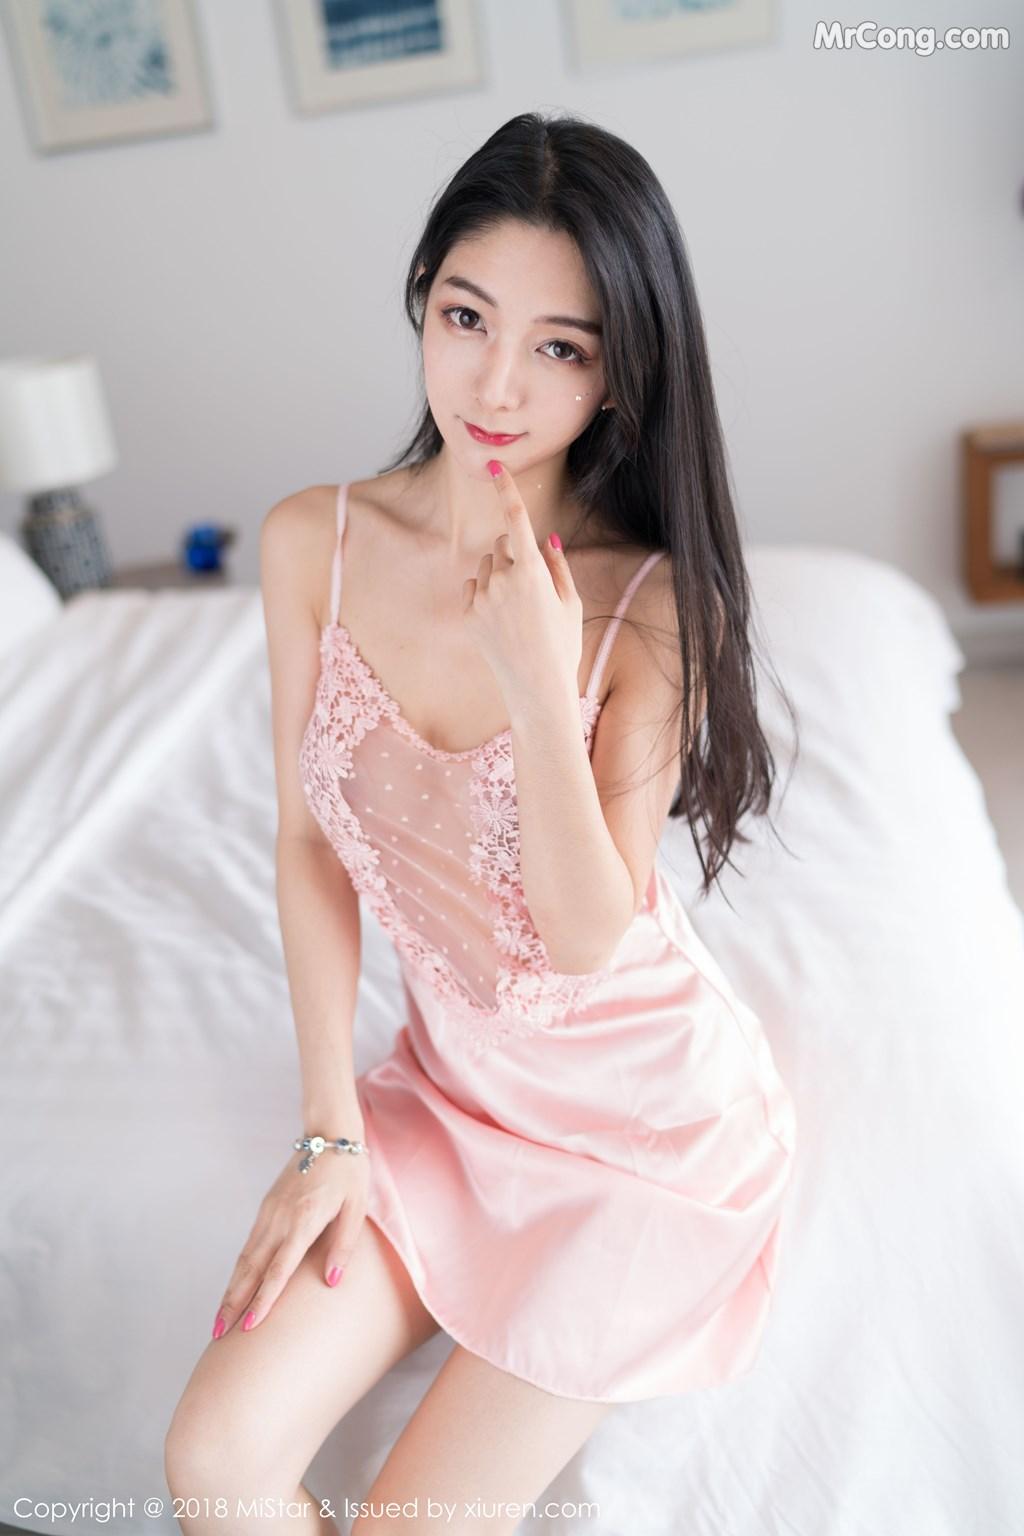 Image MiStar-Vol.238-Xiao-Reba-Angela-MrCong.com-002 in post MiStar Vol.238: Người mẫu Xiao Reba (Angela小热巴) (41 ảnh)